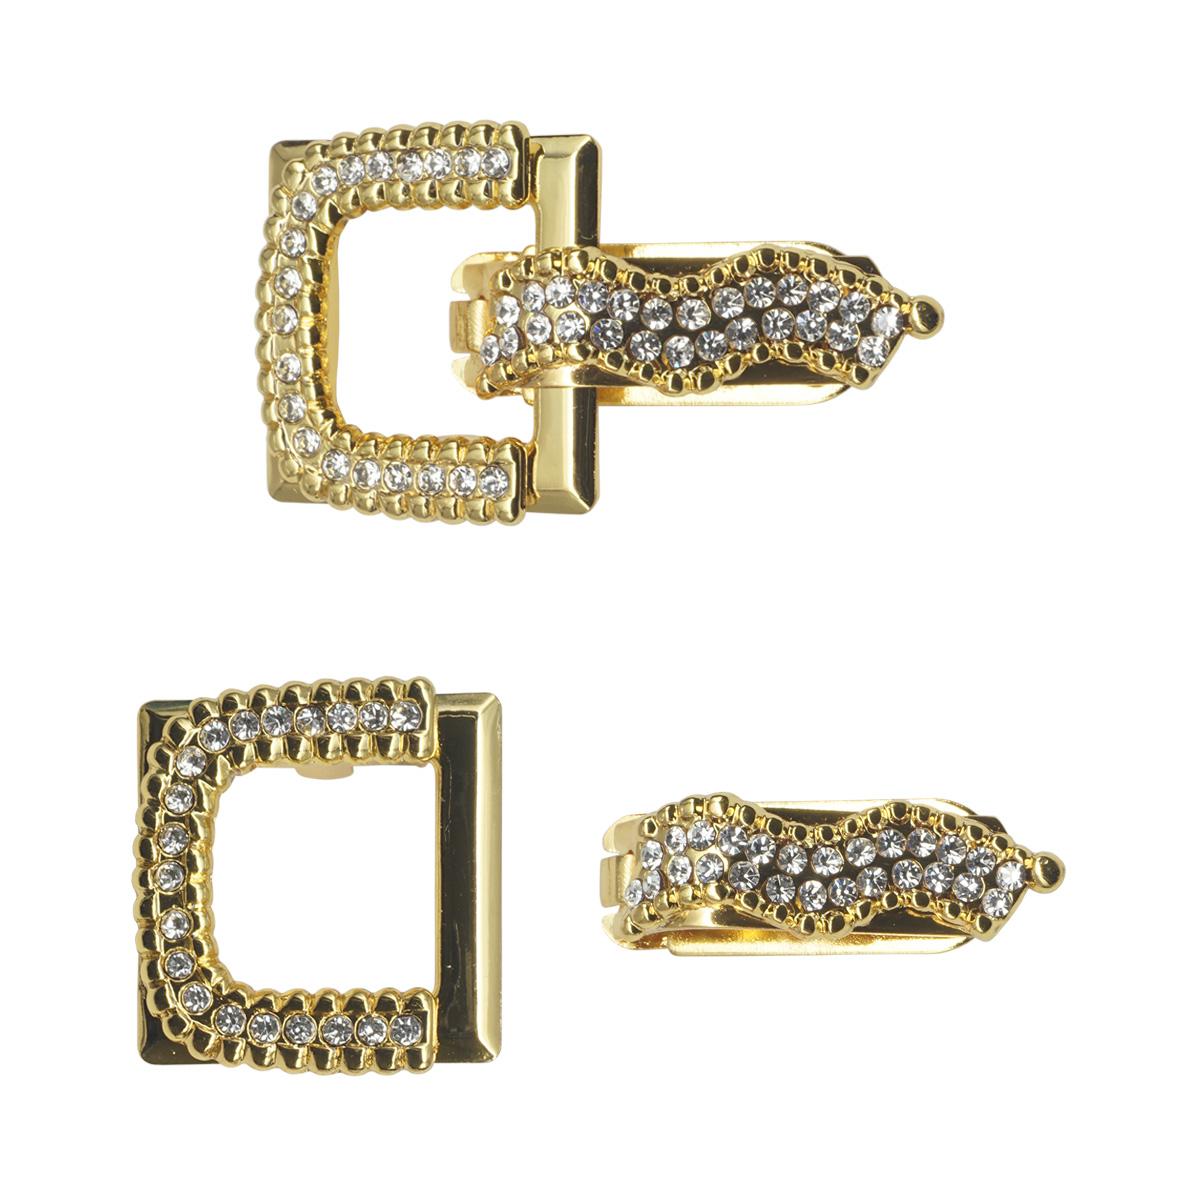 AB5275 Крючок шубный со стразами, Cristal (золото)